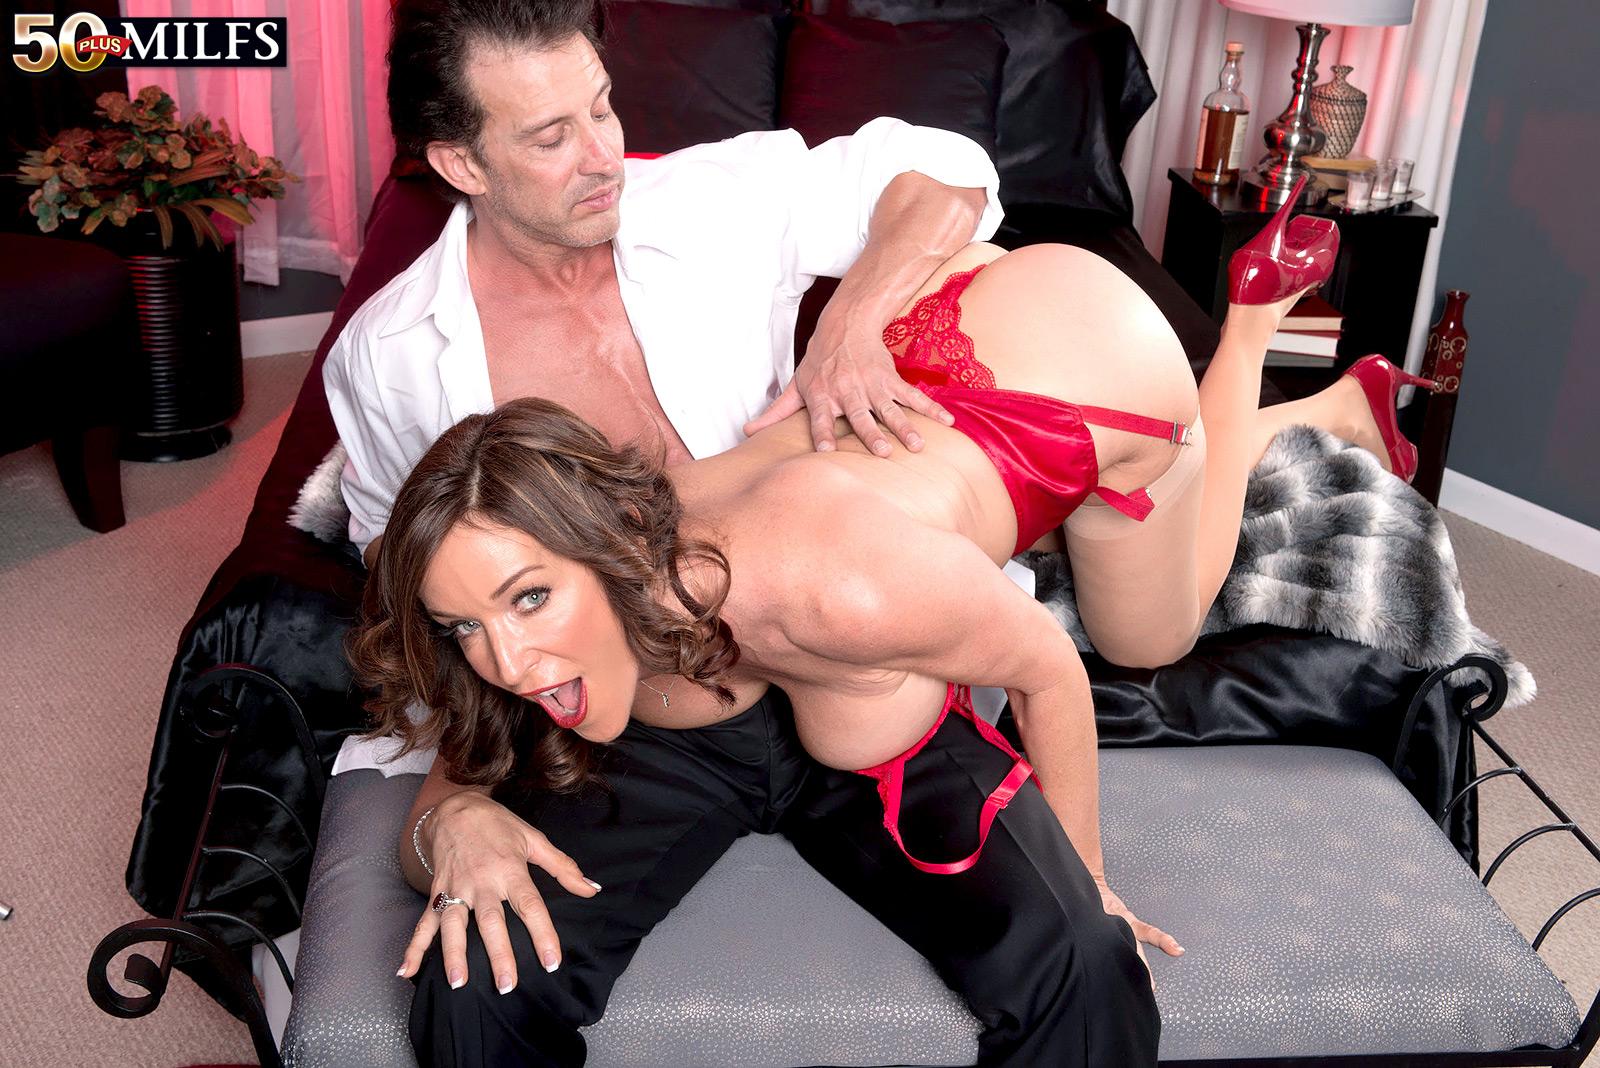 Rachel steele porn videos, amy sedaris naked ass and pussy